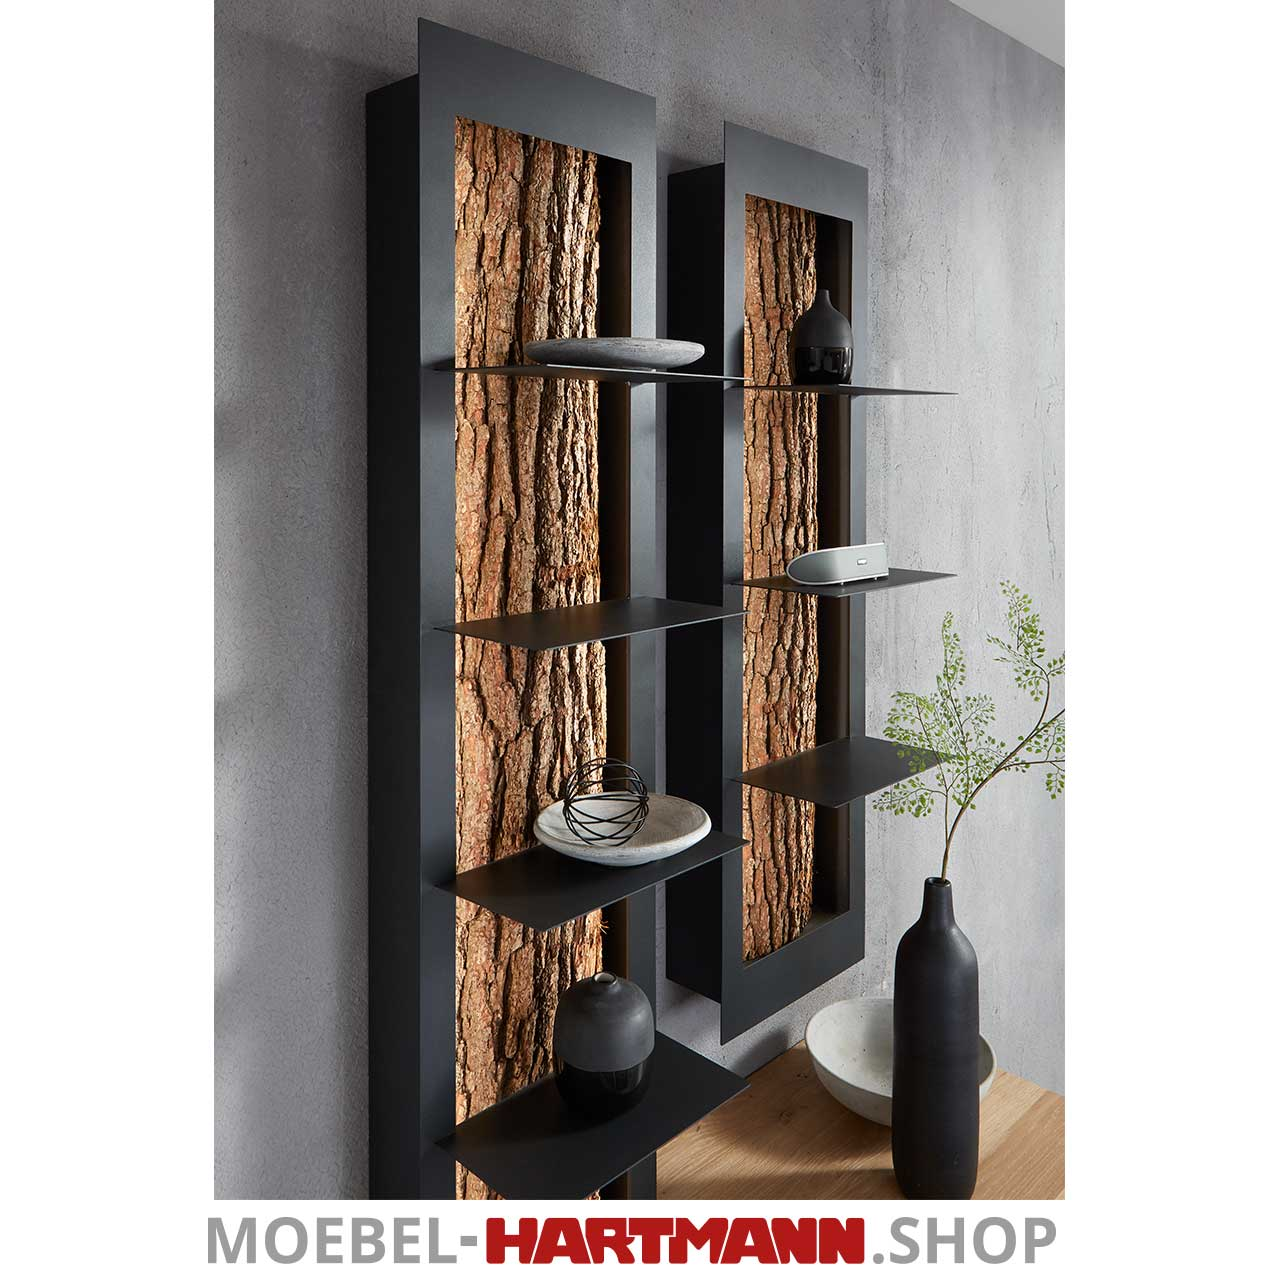 Hartmann Runa Regal Mit Rinde 8410 7031 Moebel Hartmann Shop